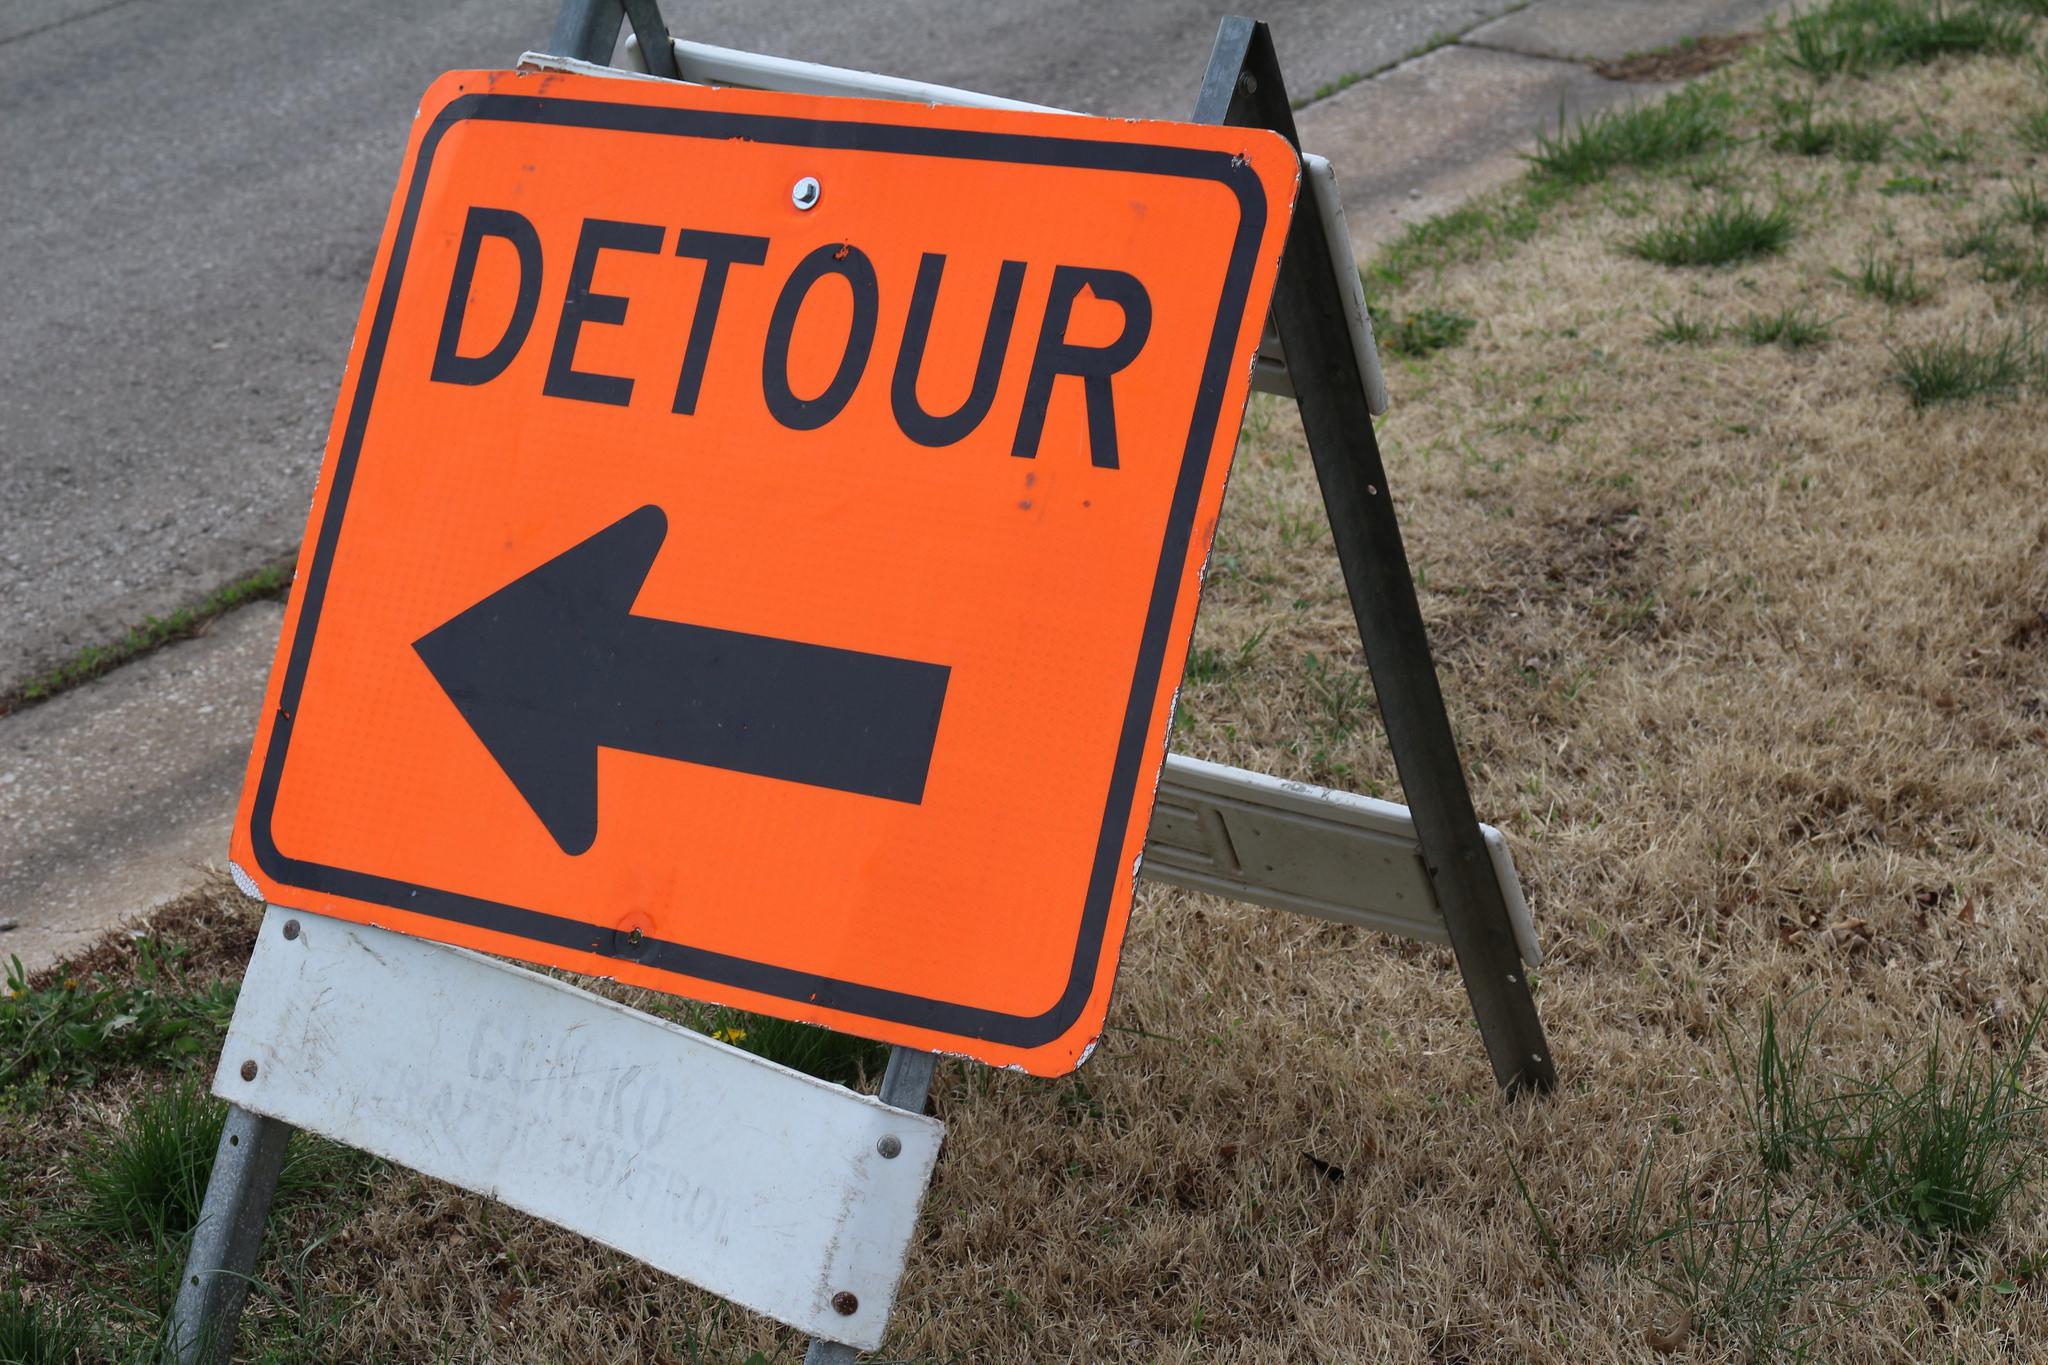 Detour sign. (Photo: CodyJung/Flickr)